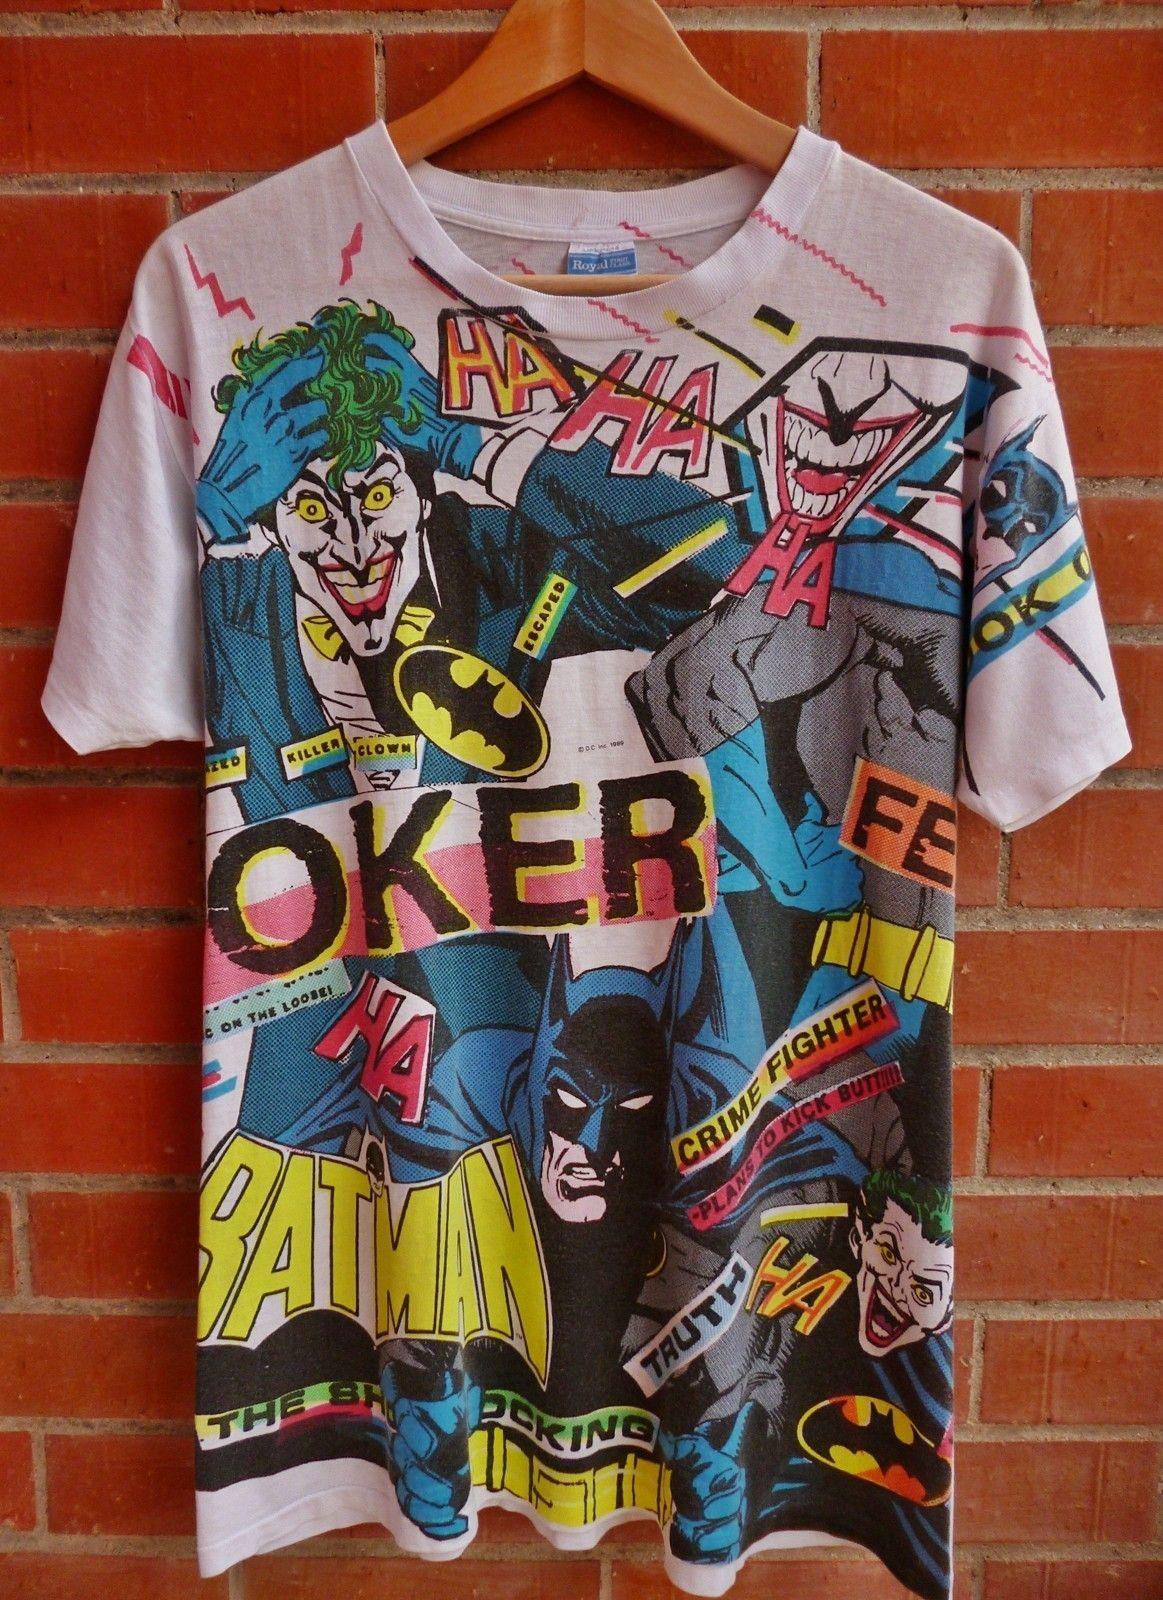 VINTAGE 90s Superman T-Shirt Rare Out of Print DC COMICS NEW Collectible Batman